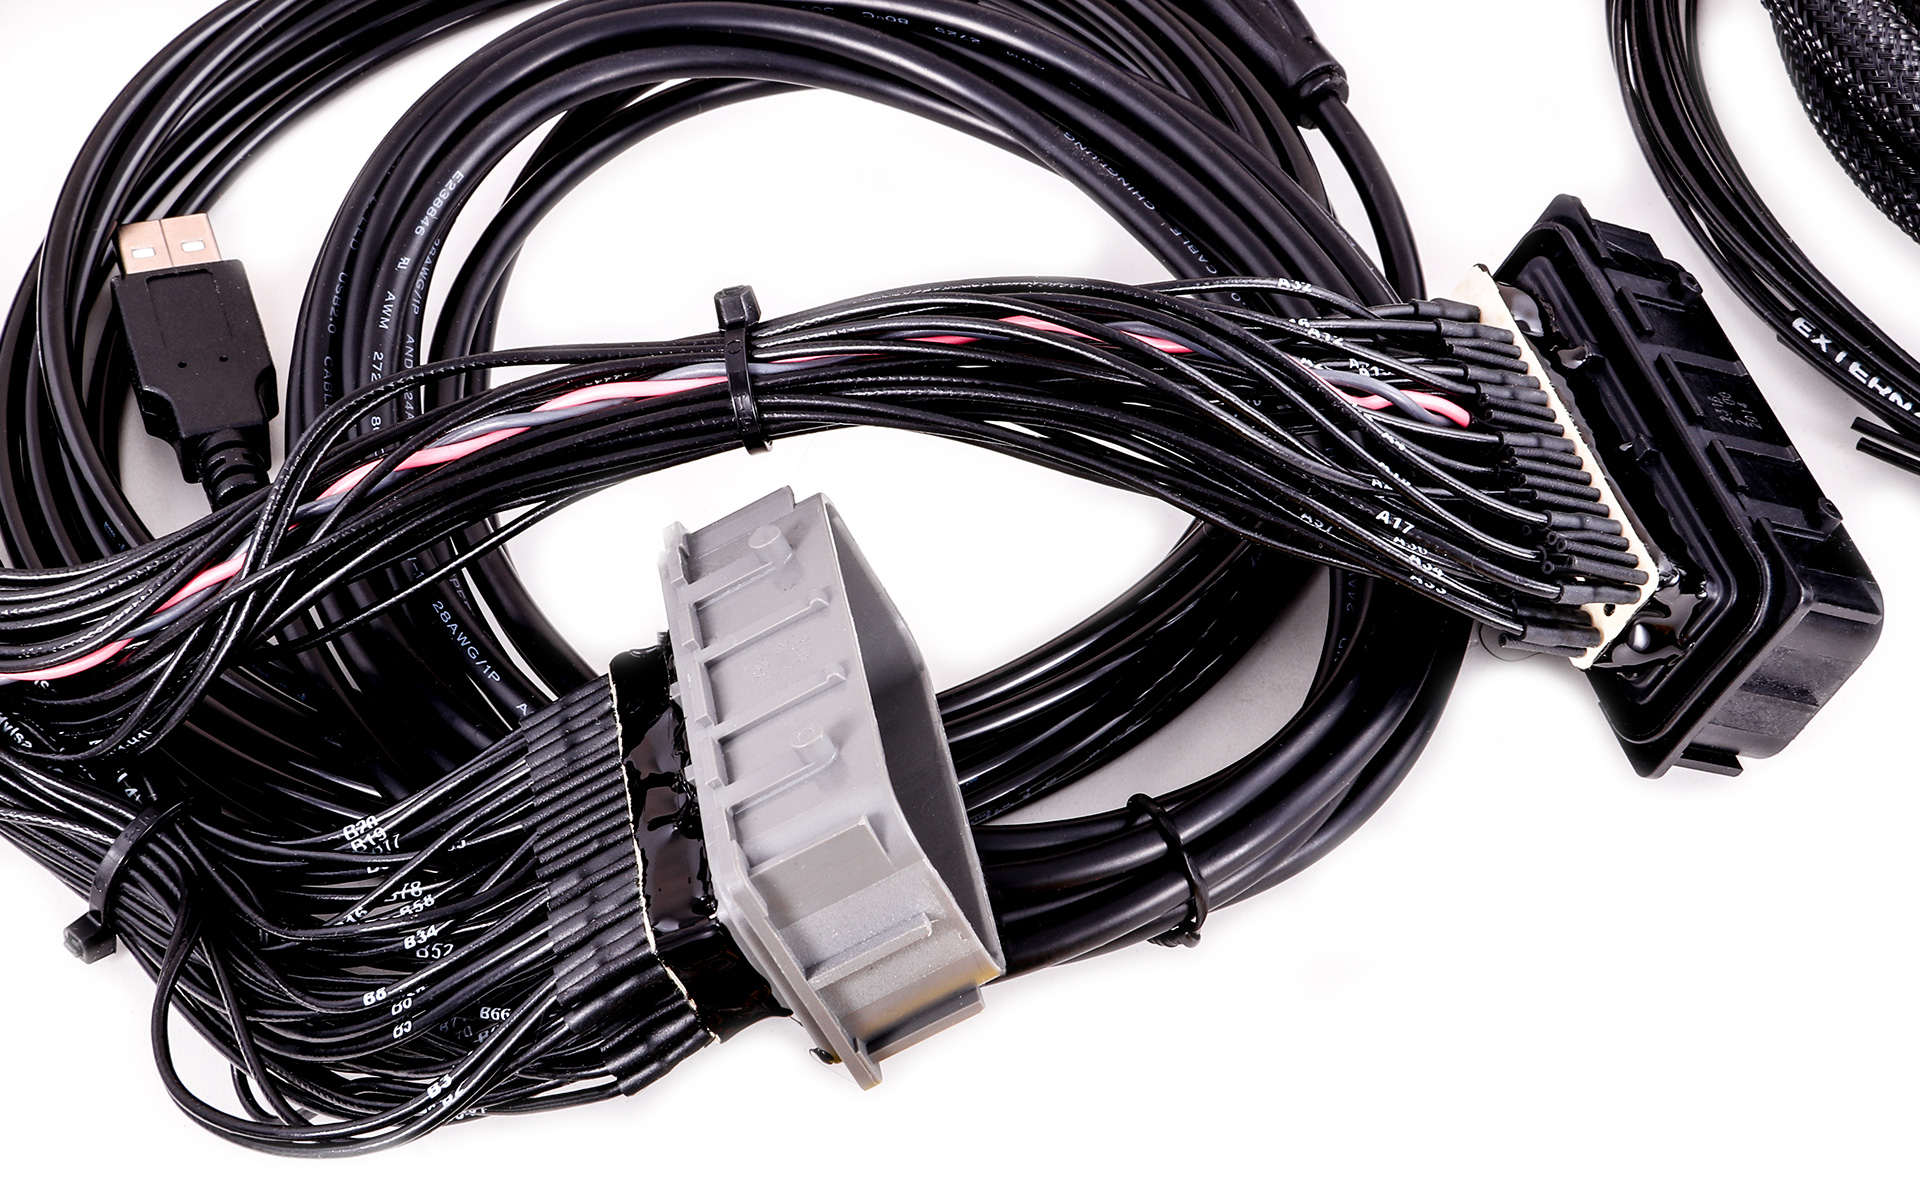 Maxxecu Pro Plugin Ecu For Corvette C6 E38 Bmw Dme Wiring Ecm Connectors